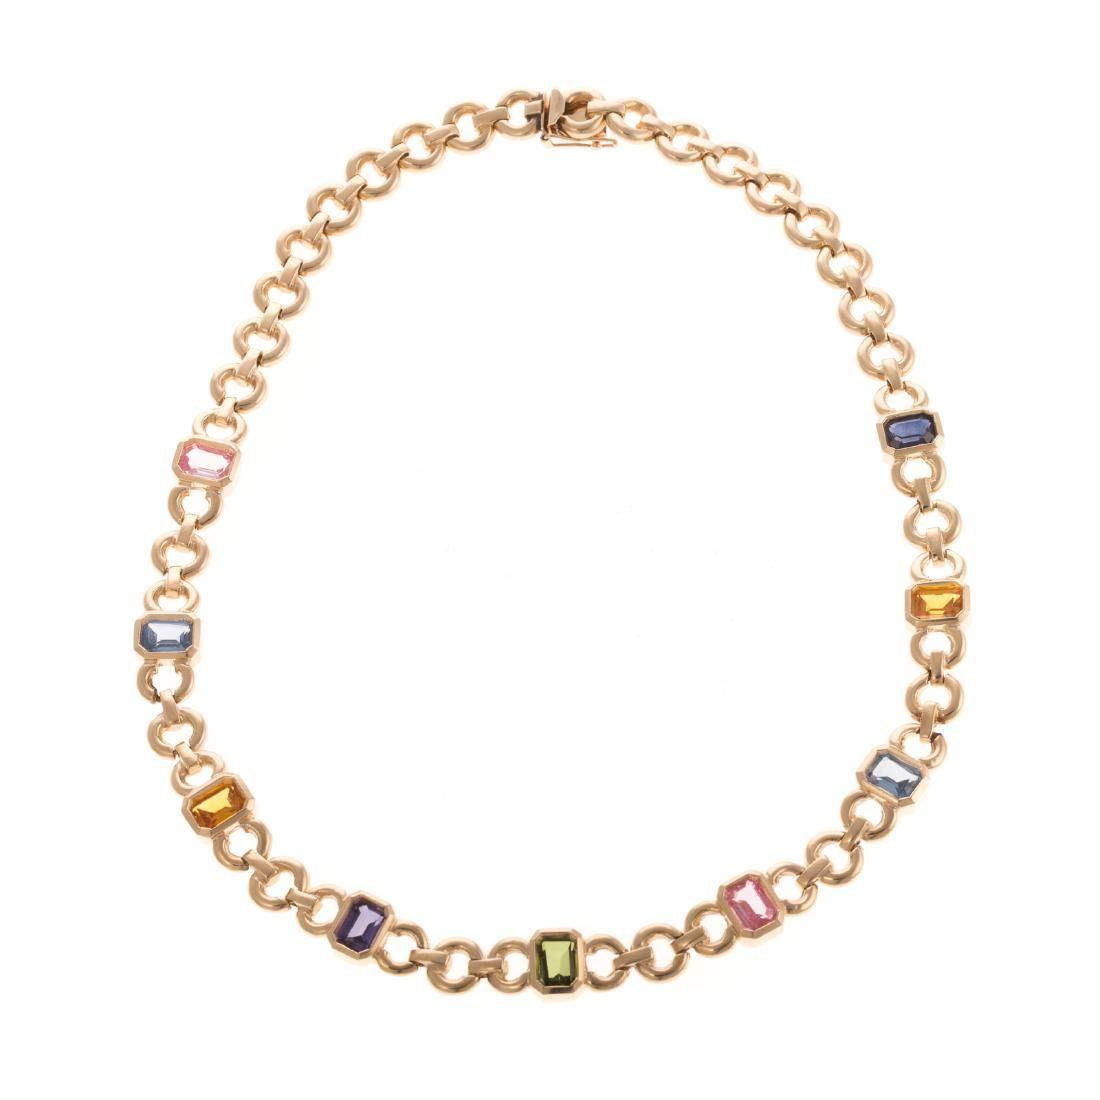 A Ladies Gemstone Necklace in 14K Gold